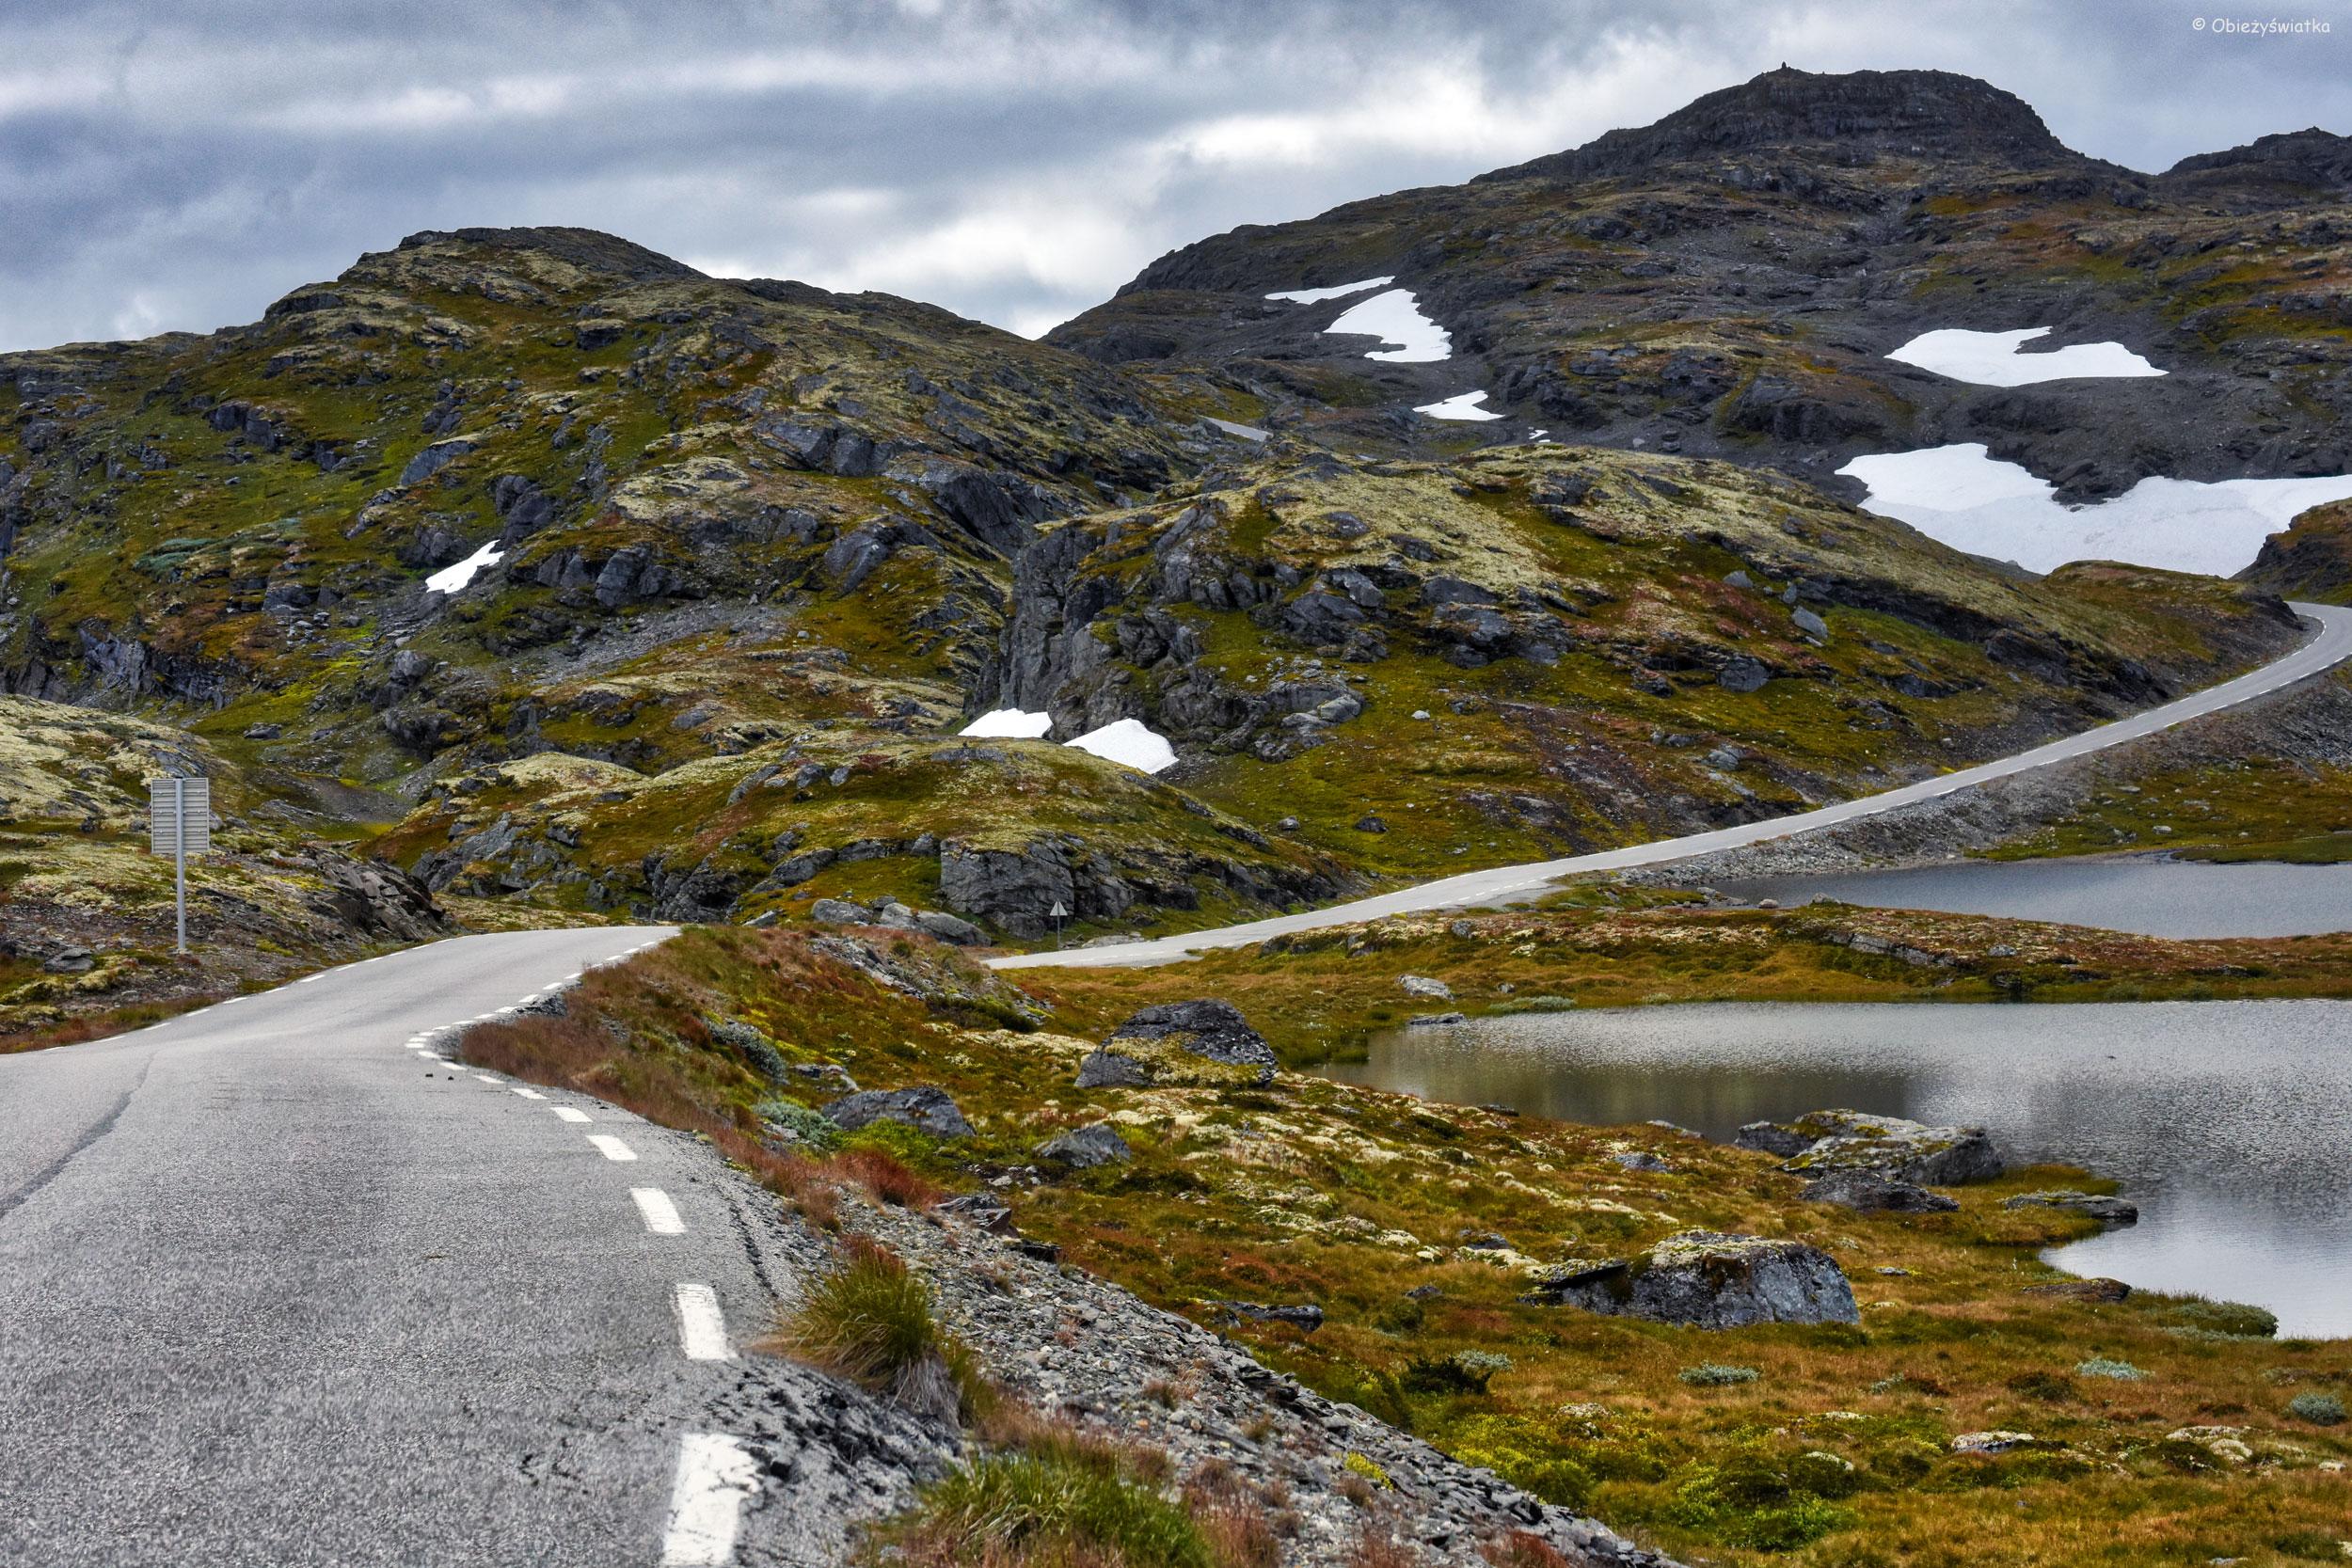 Surowy krajobraz Aurlandsfjellet, Norwegia